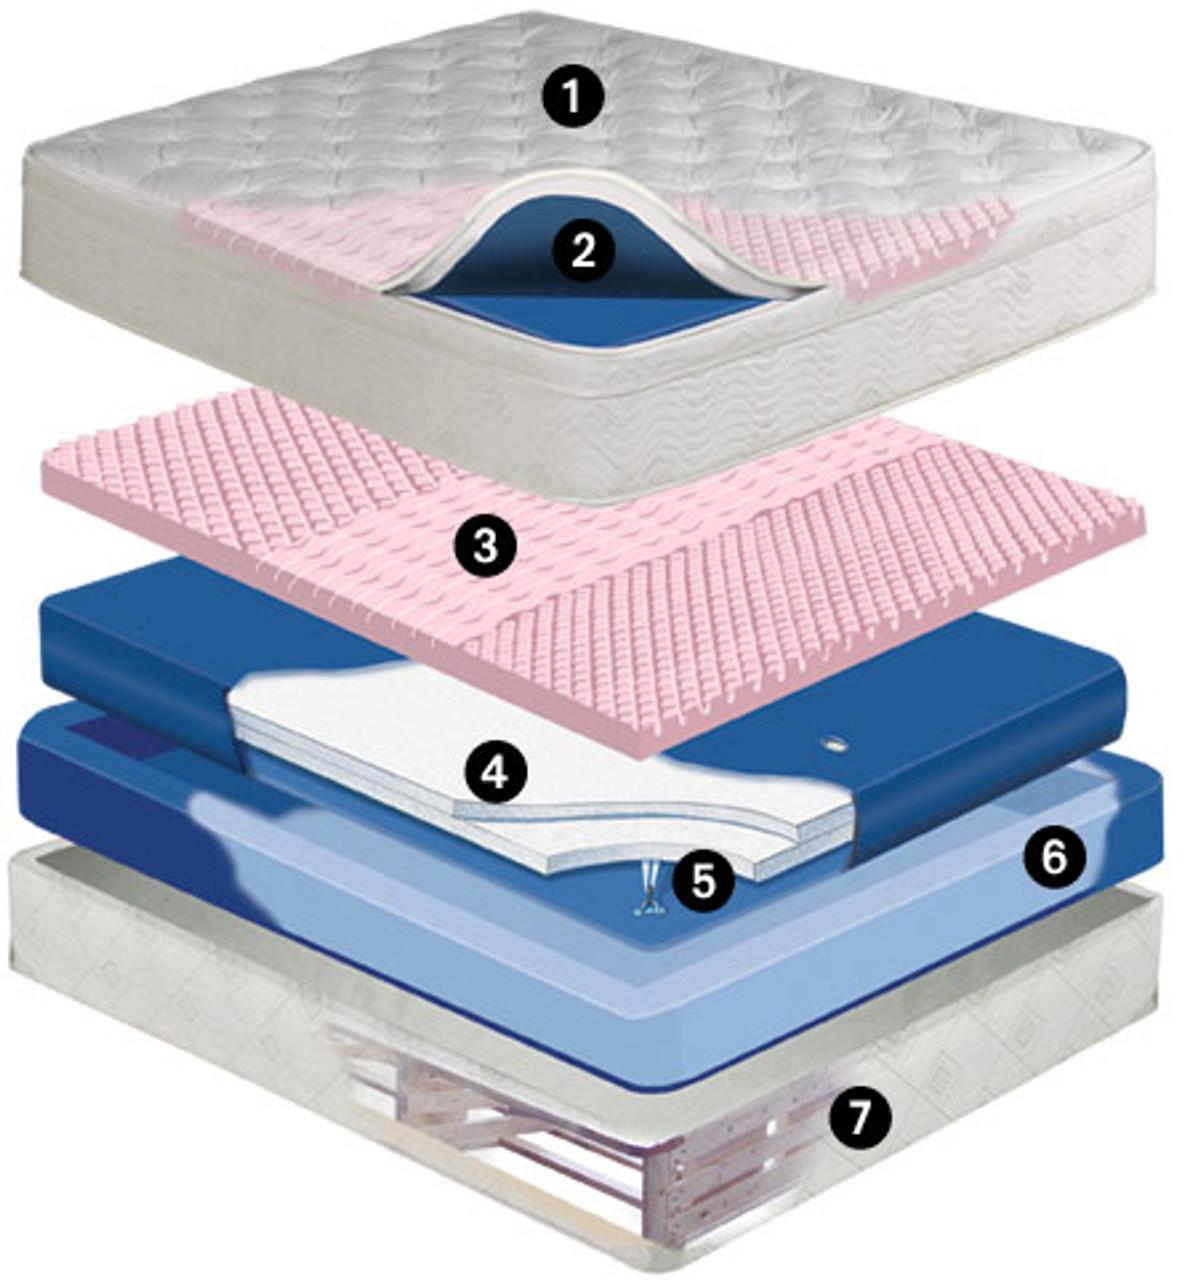 Dreamscape Mid Fill 11 inch softside waterbed mattress Waveless Mattress